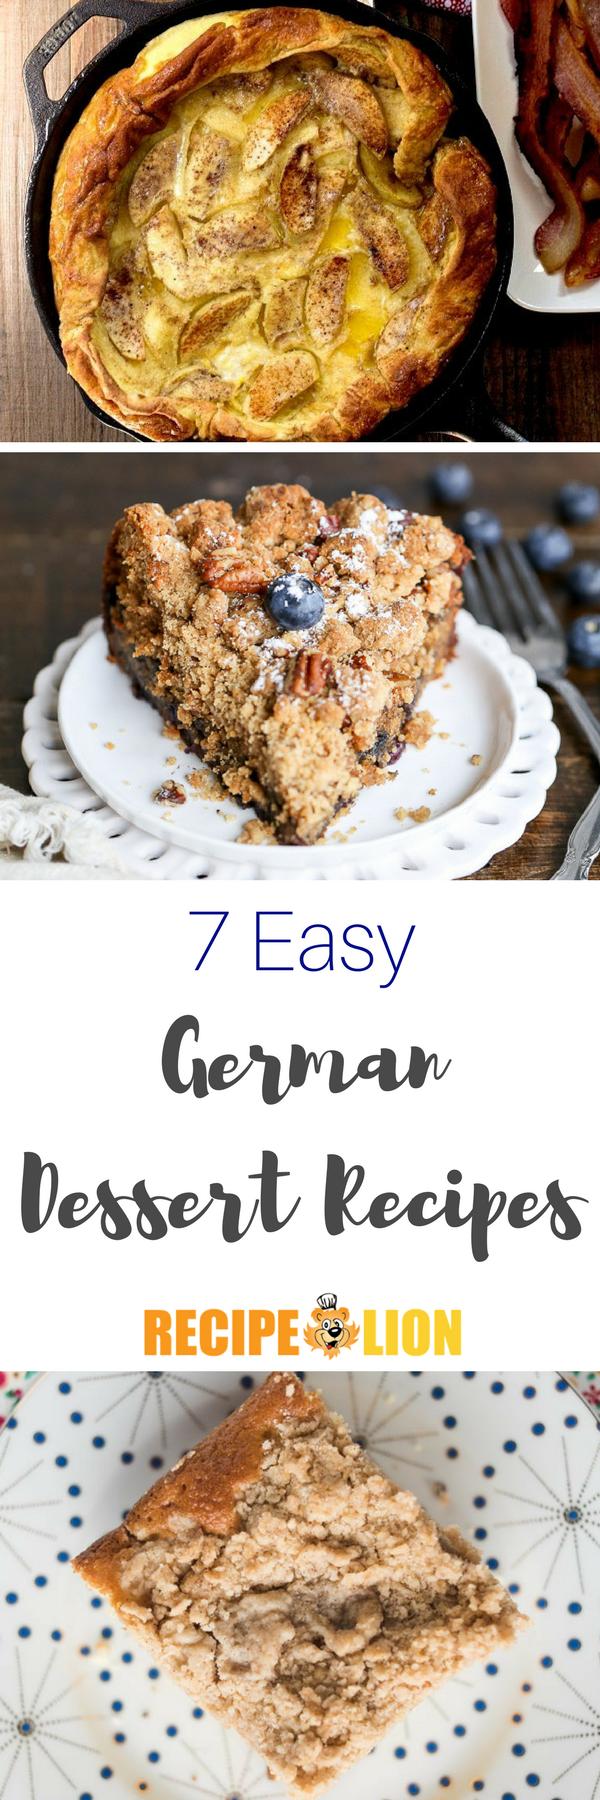 9 Easy German Dessert Recipes German Desserts Dessert Recipes Desserts